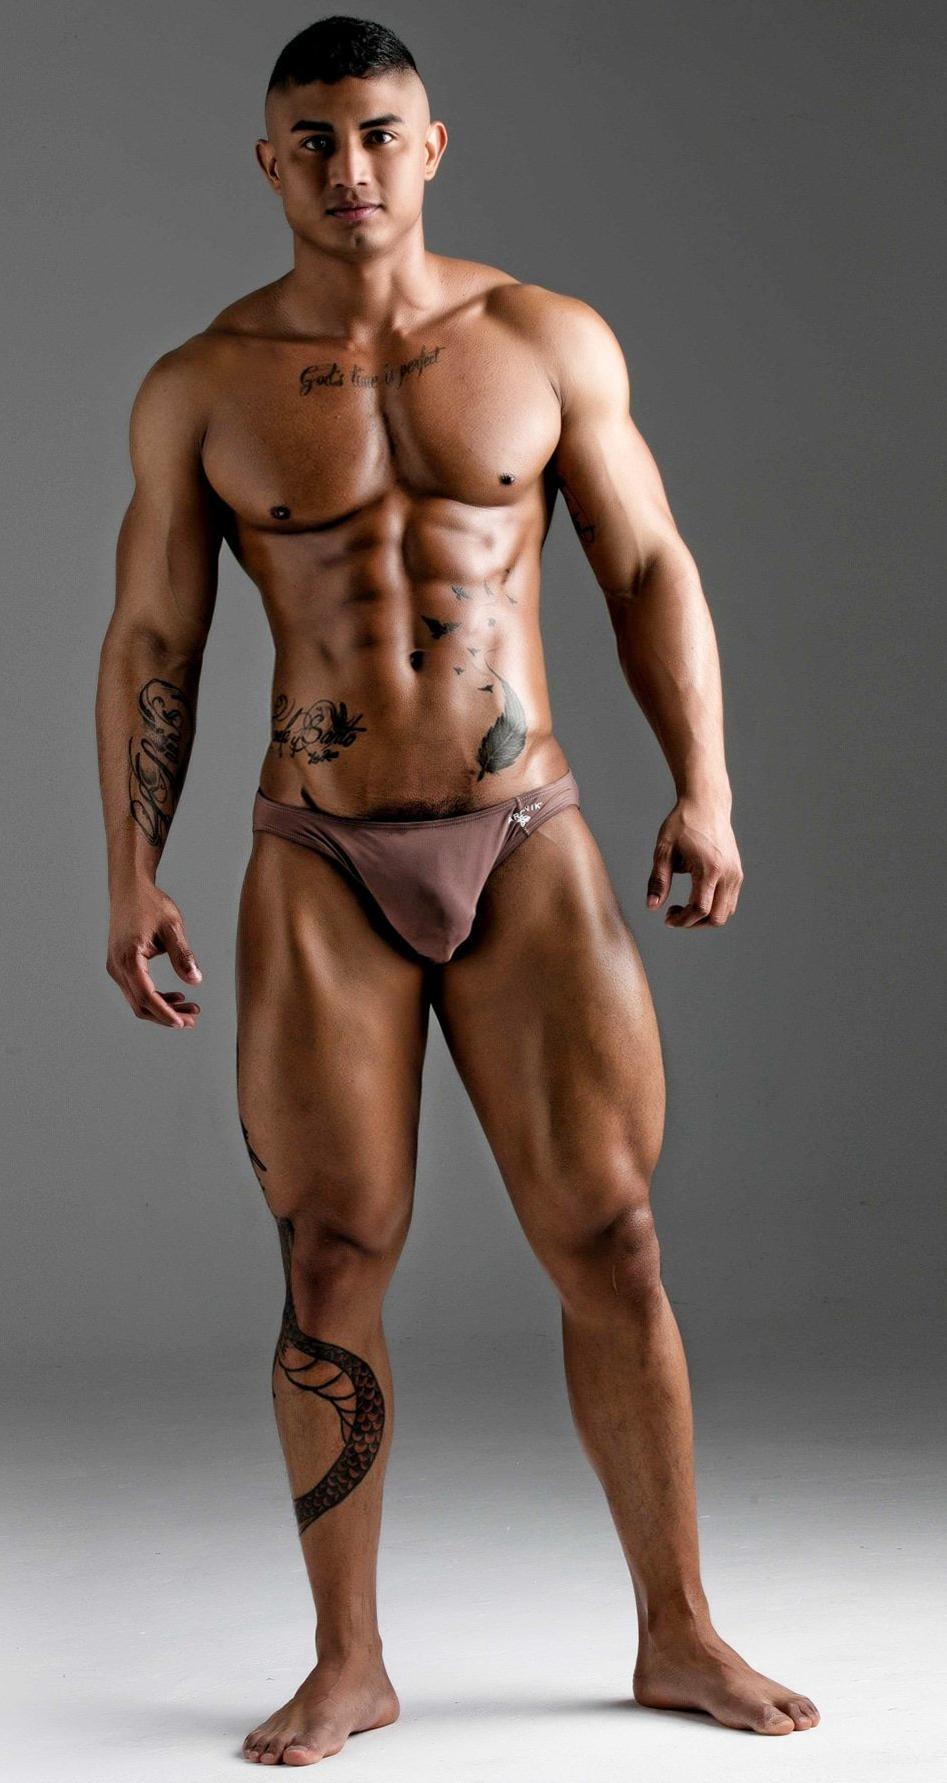 bikini 4 Mens sides 1